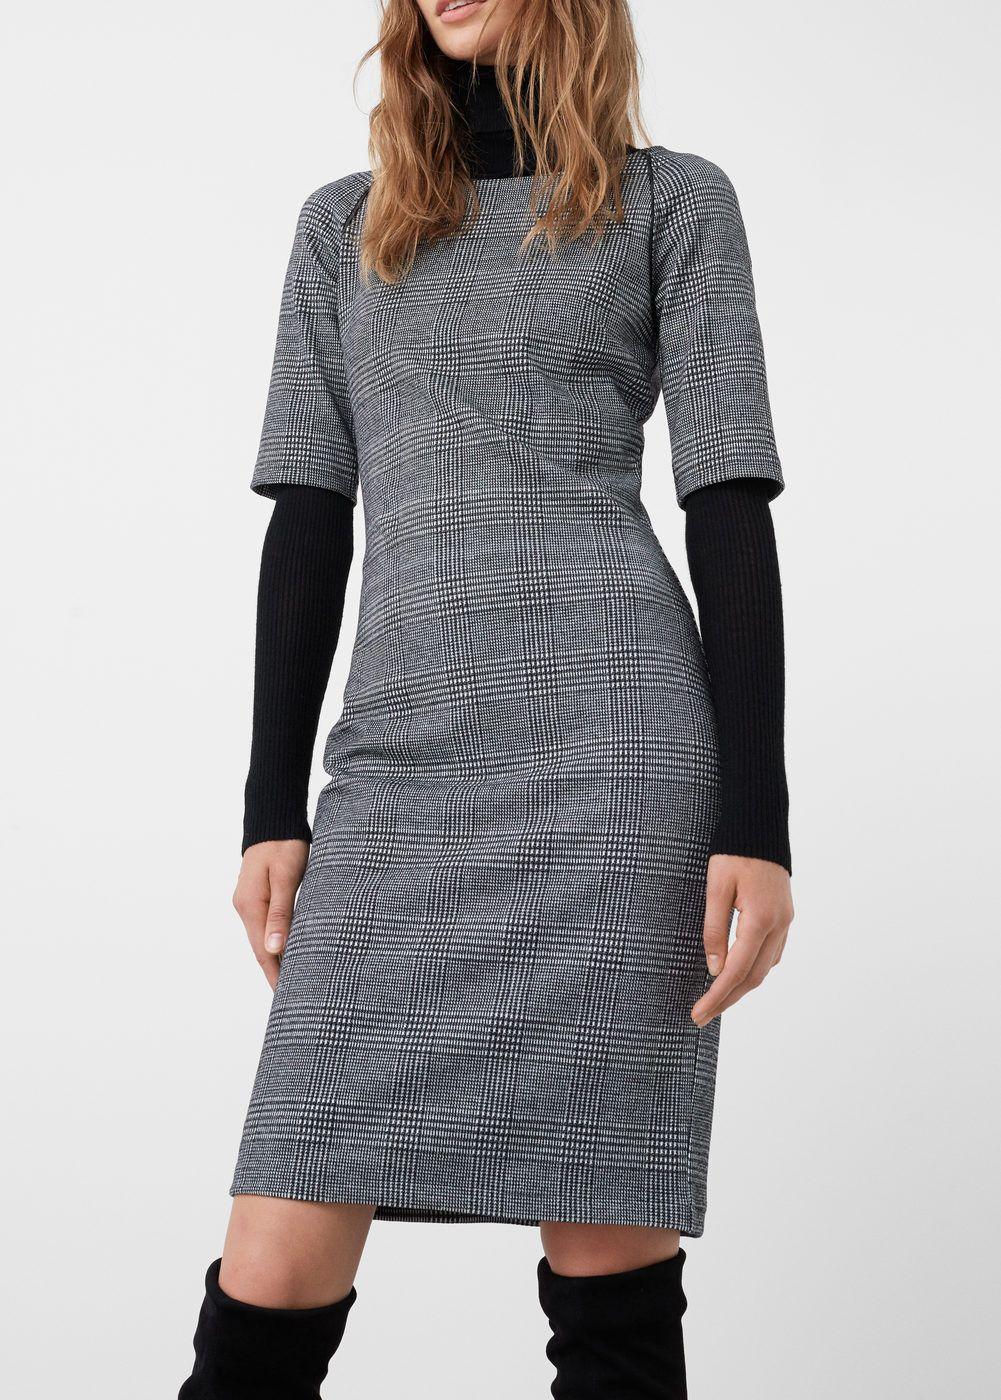 En Femme Prince Galles Robe De RobeHiver 2019Clothes nOPw0k8X